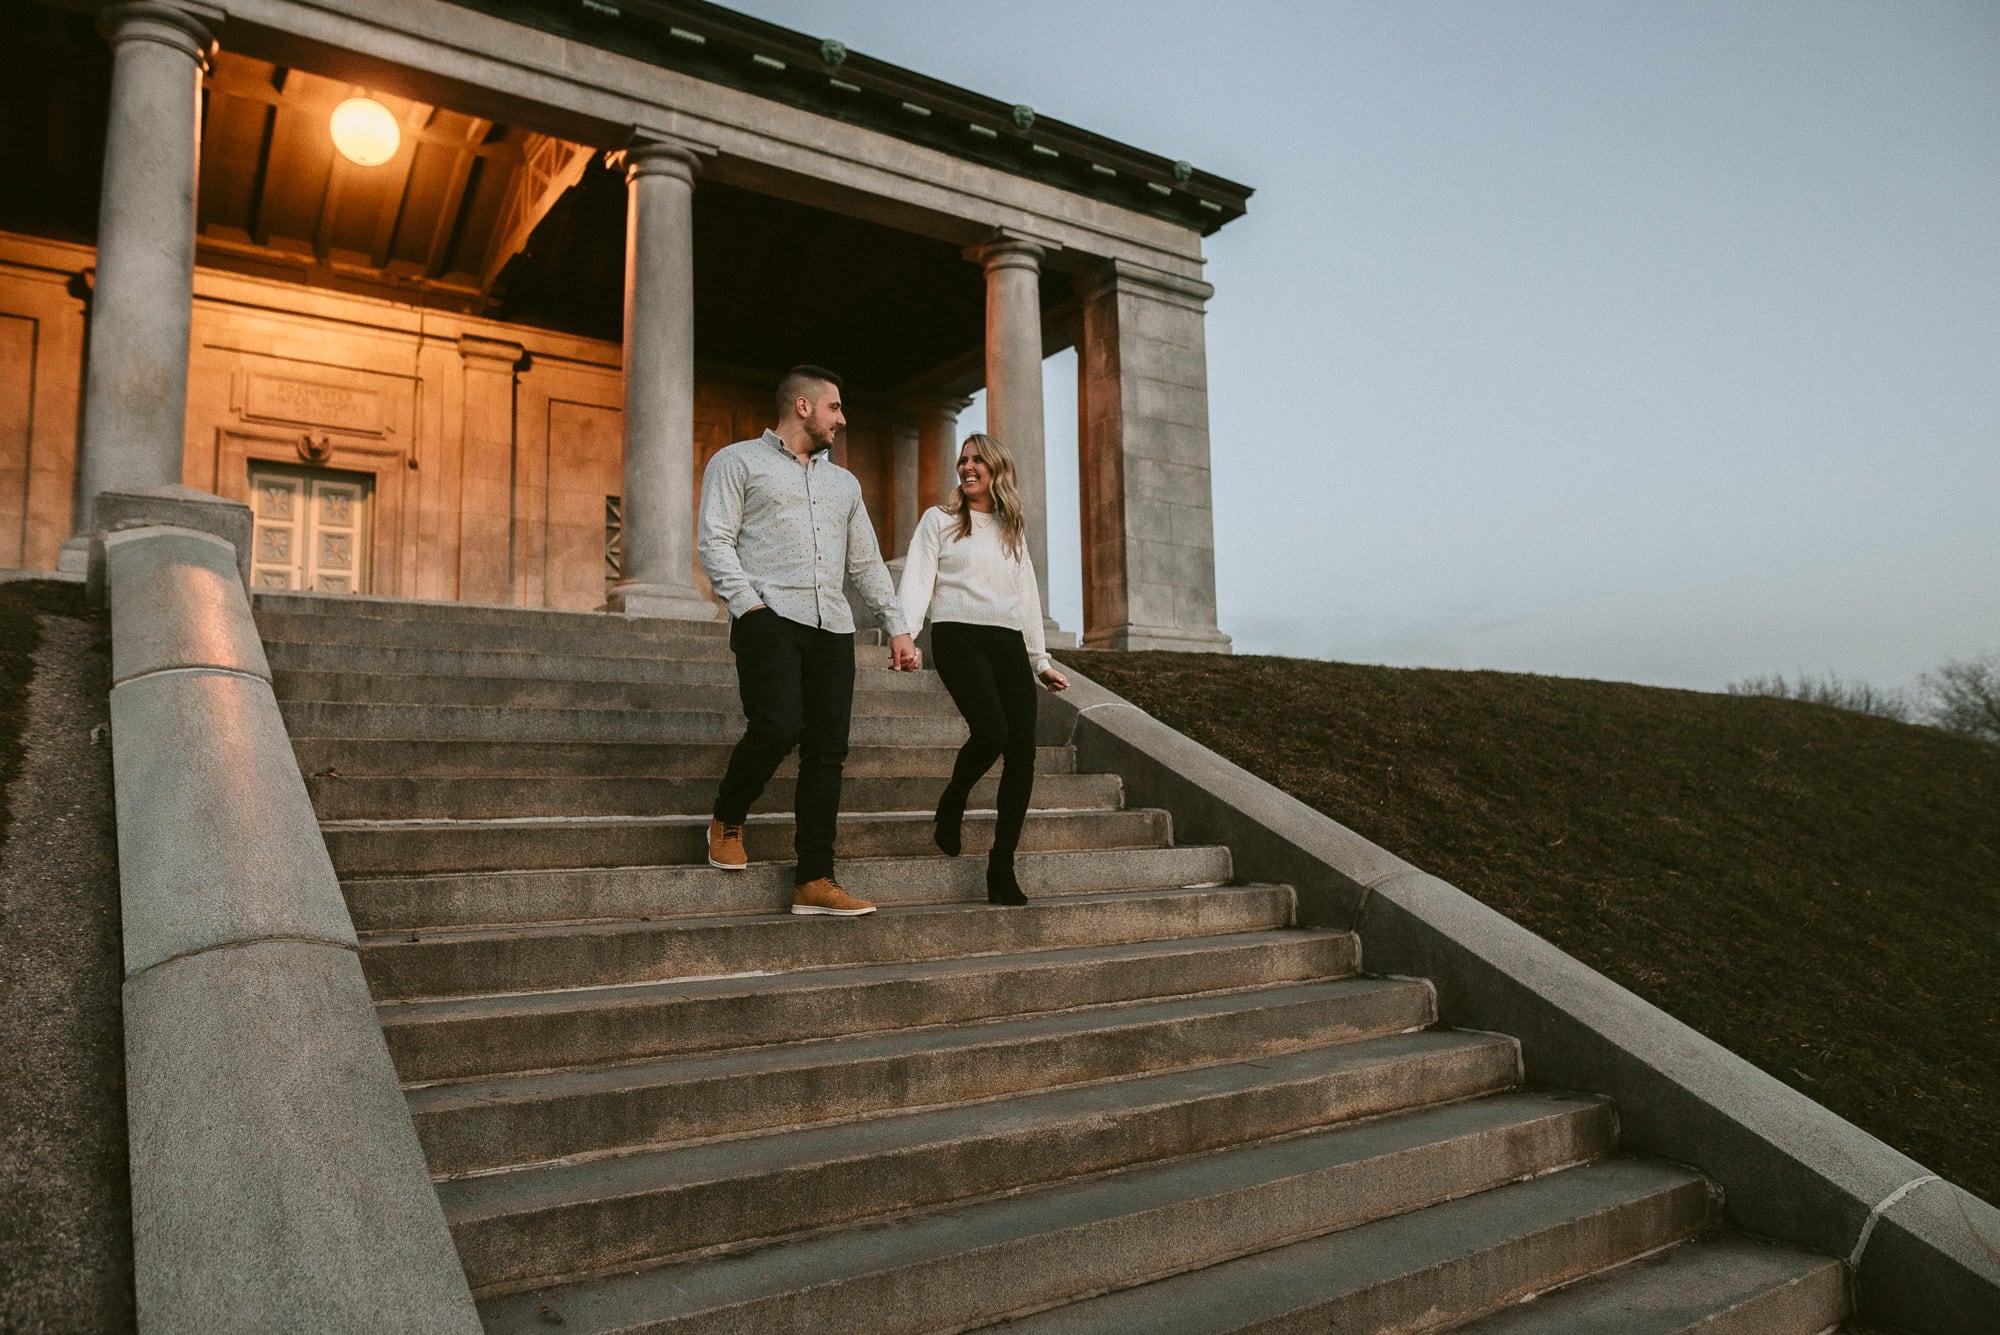 Engagement photos at Cobb's Hill, Photo by Matt Lim